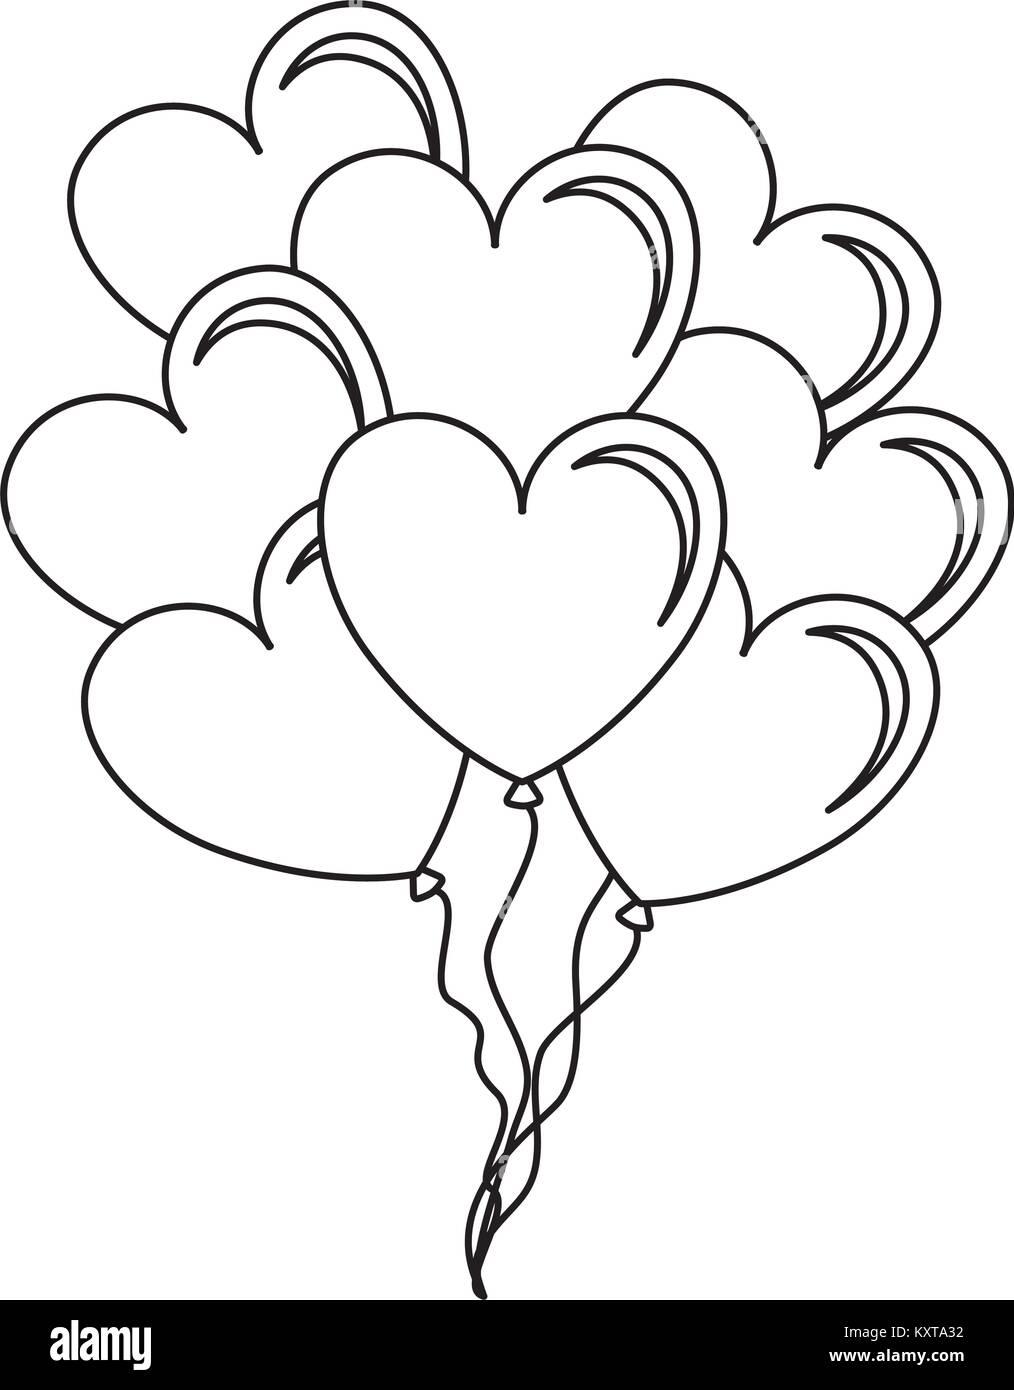 Balloons Air With Heart Shape Stock Vector Art Illustration